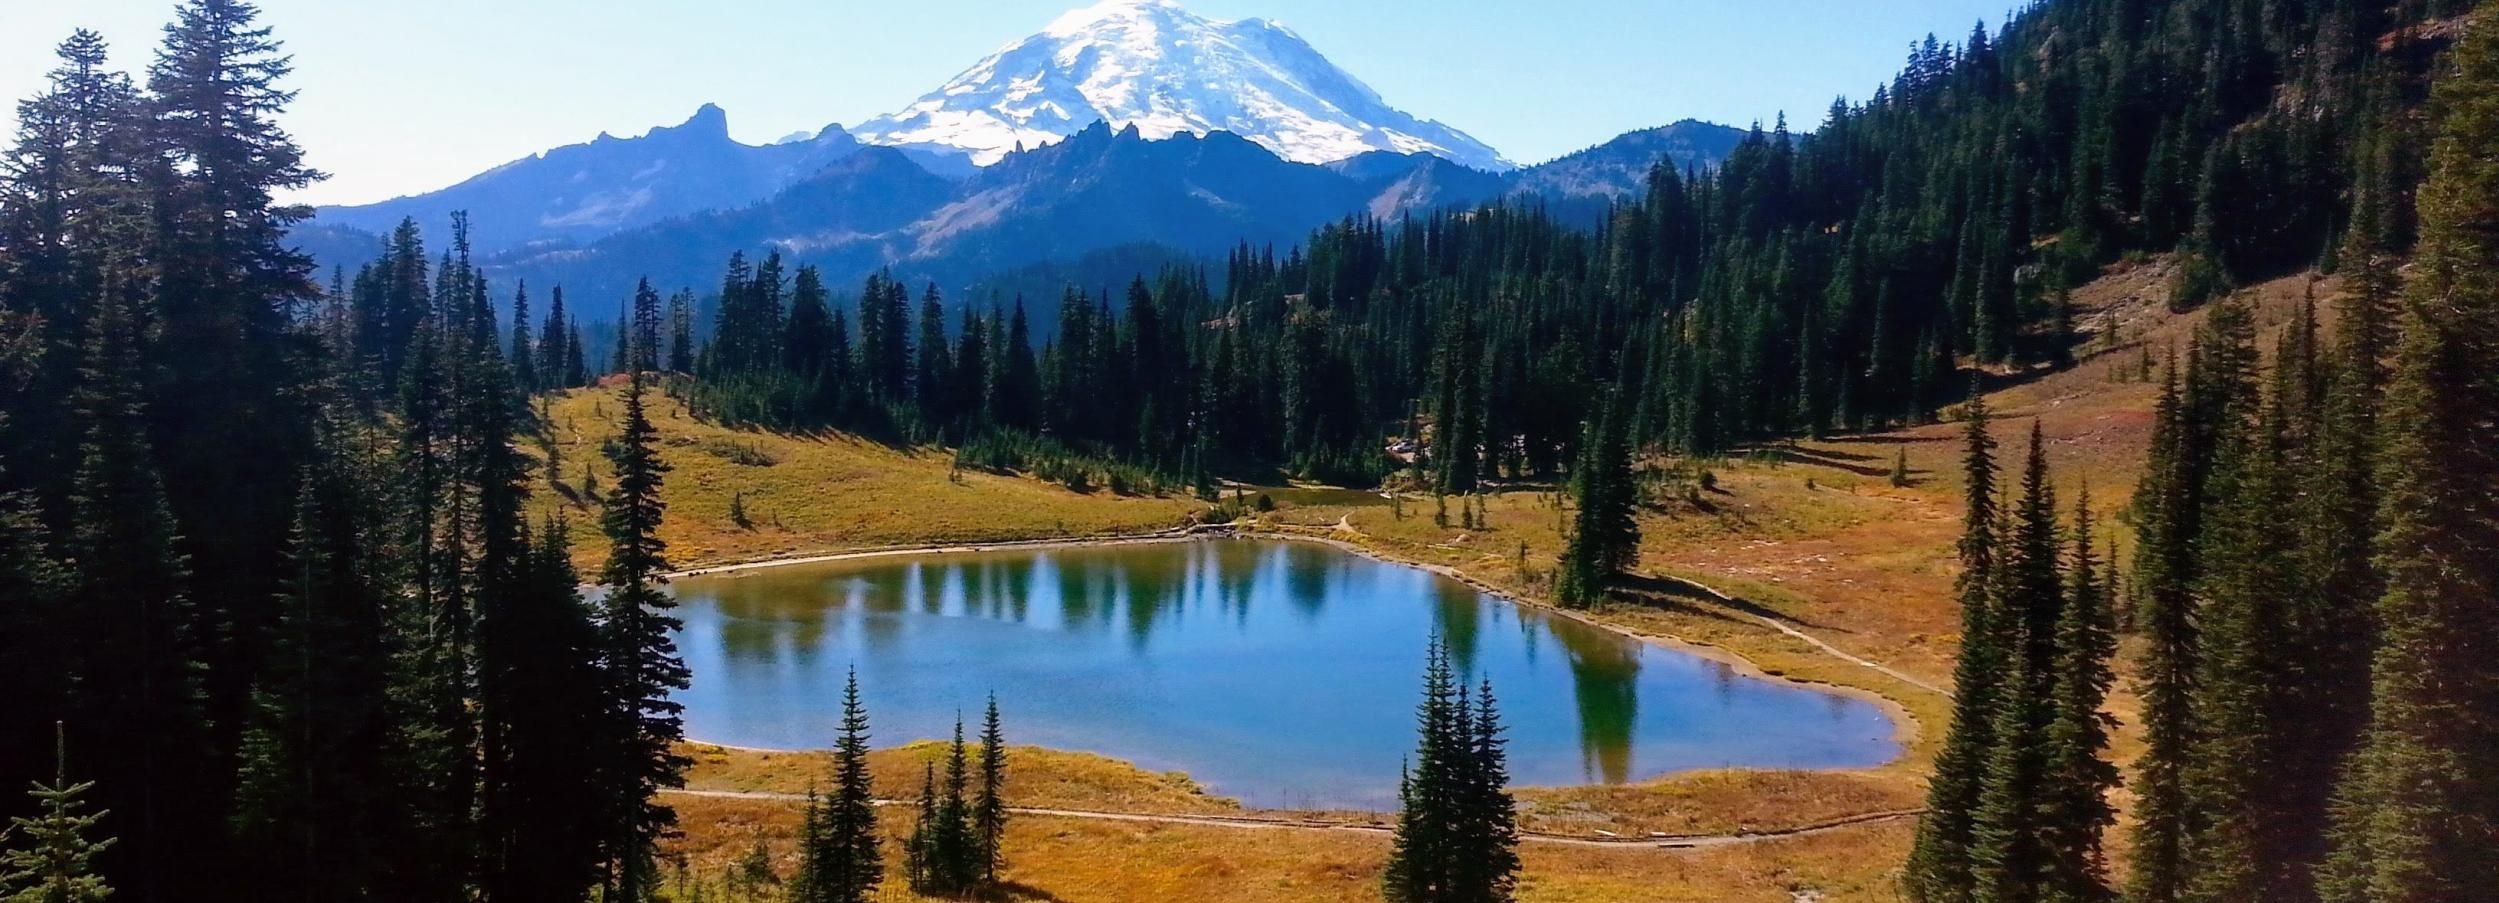 Seattle All-Inclusive: Hike Mt. Rainier and Wine Tasting